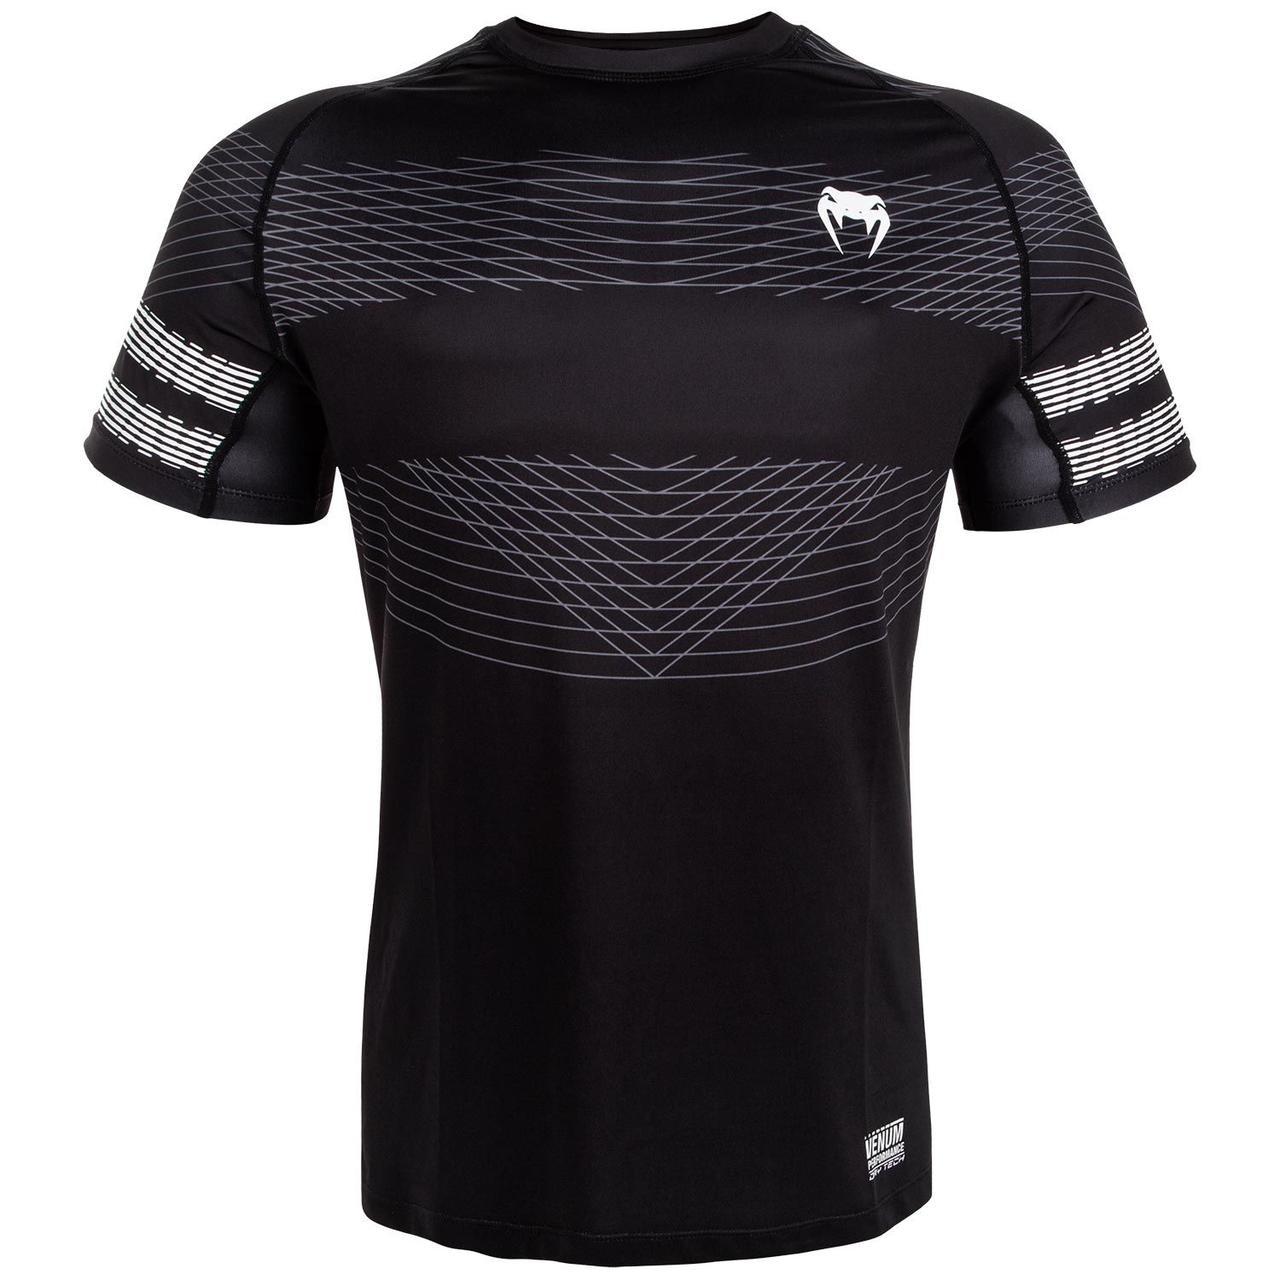 Футболка Venum Club 182 Dry Tech T-shirt Black